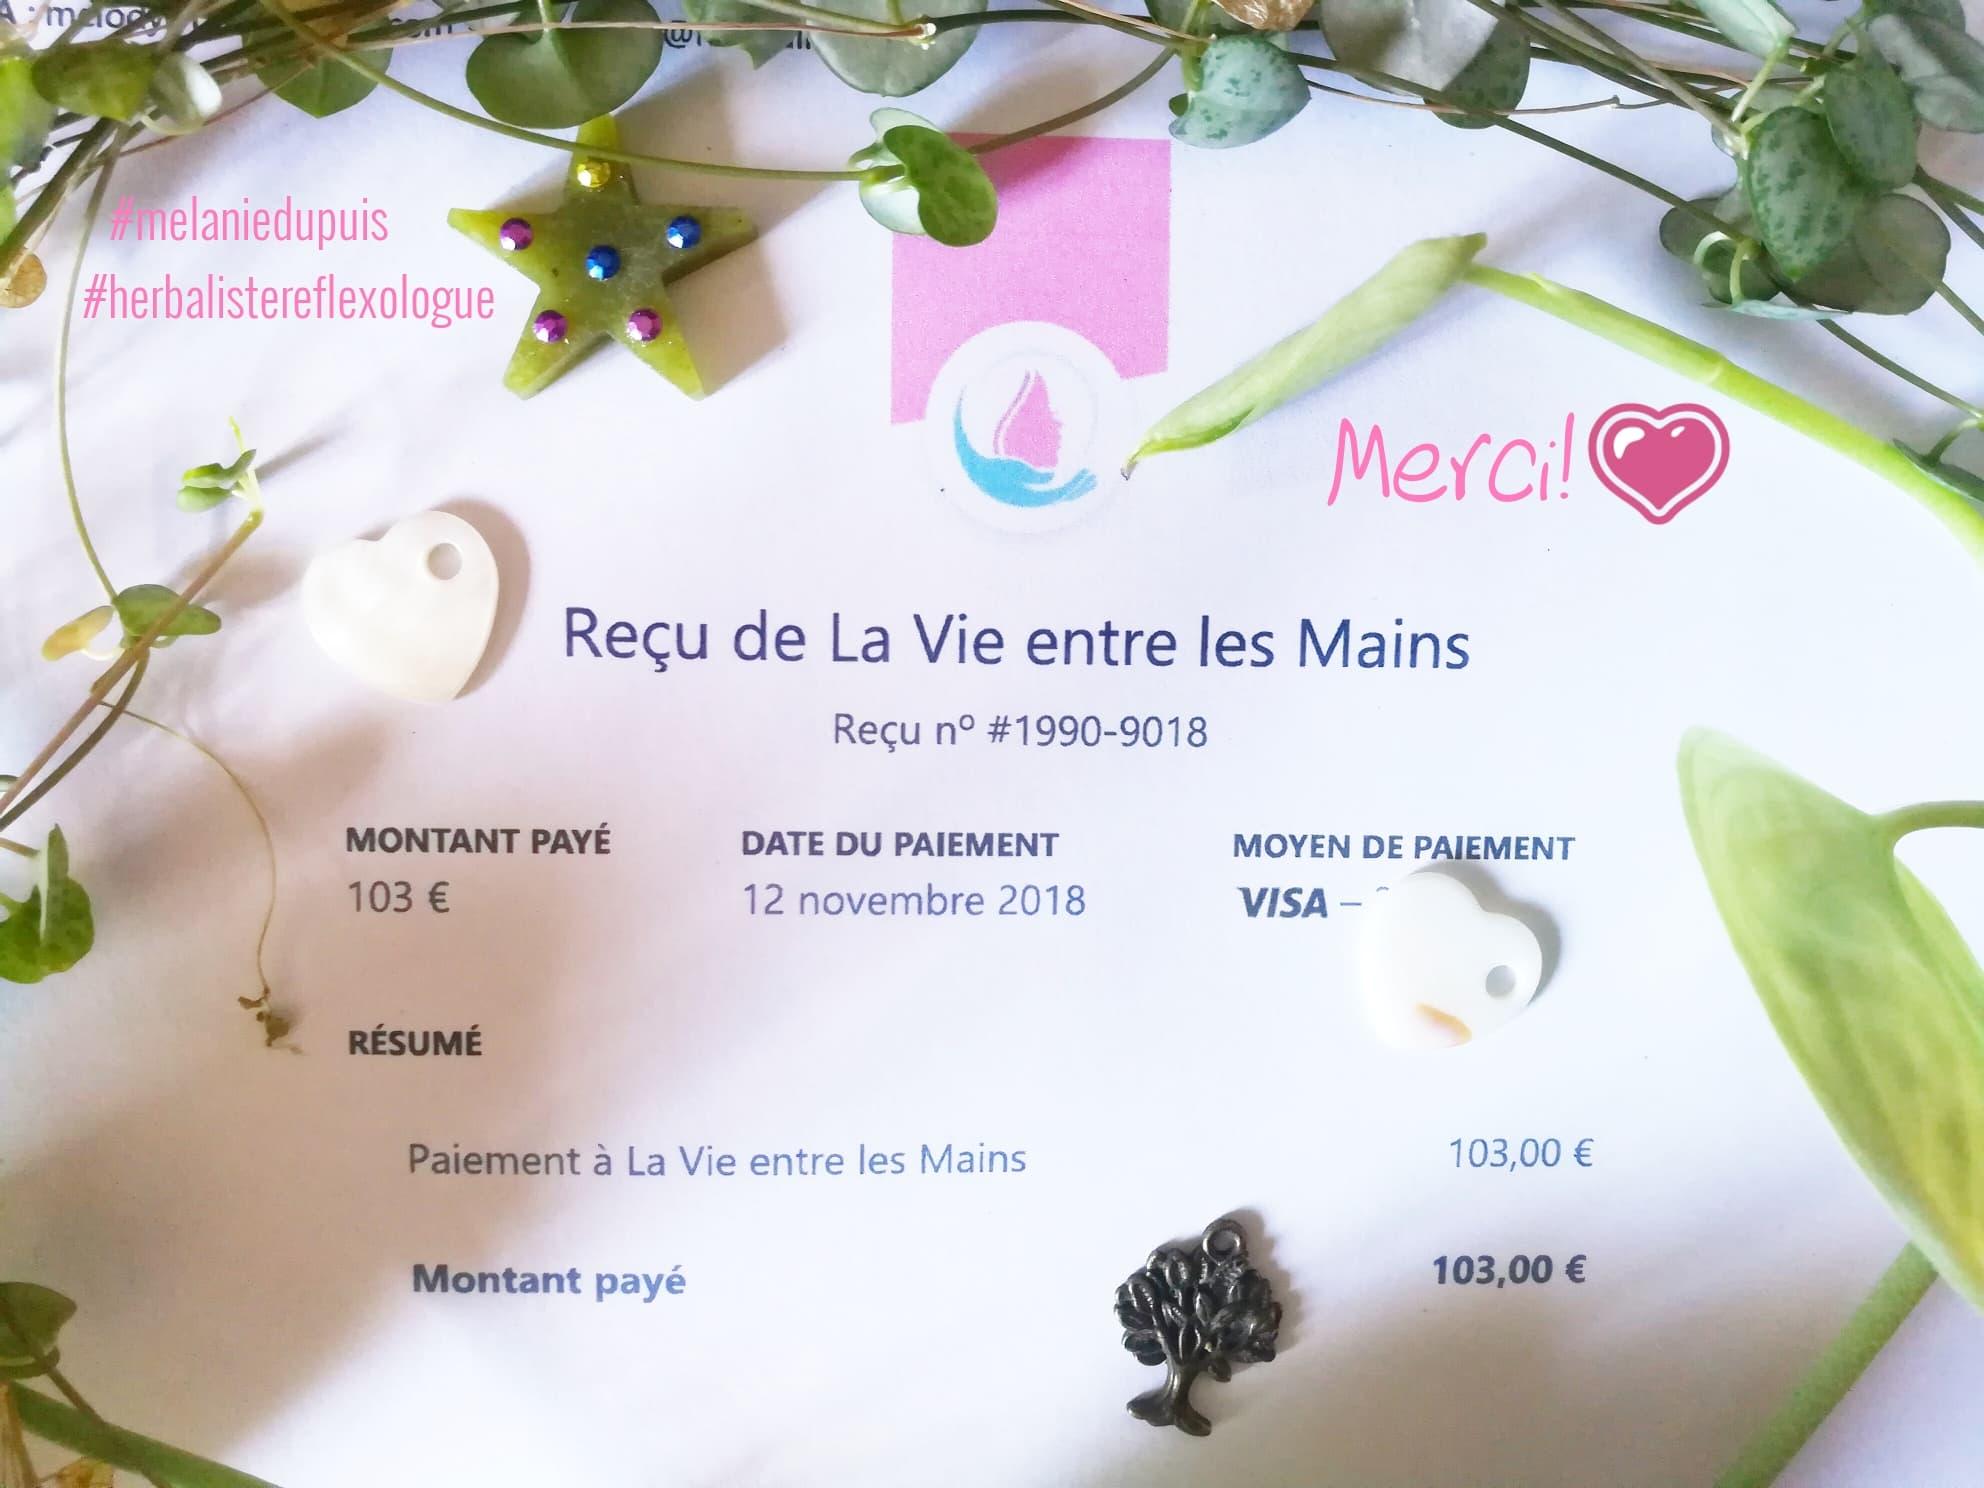 GC - reflexologie melanie dupuis - ariege - don octobre rose 2018